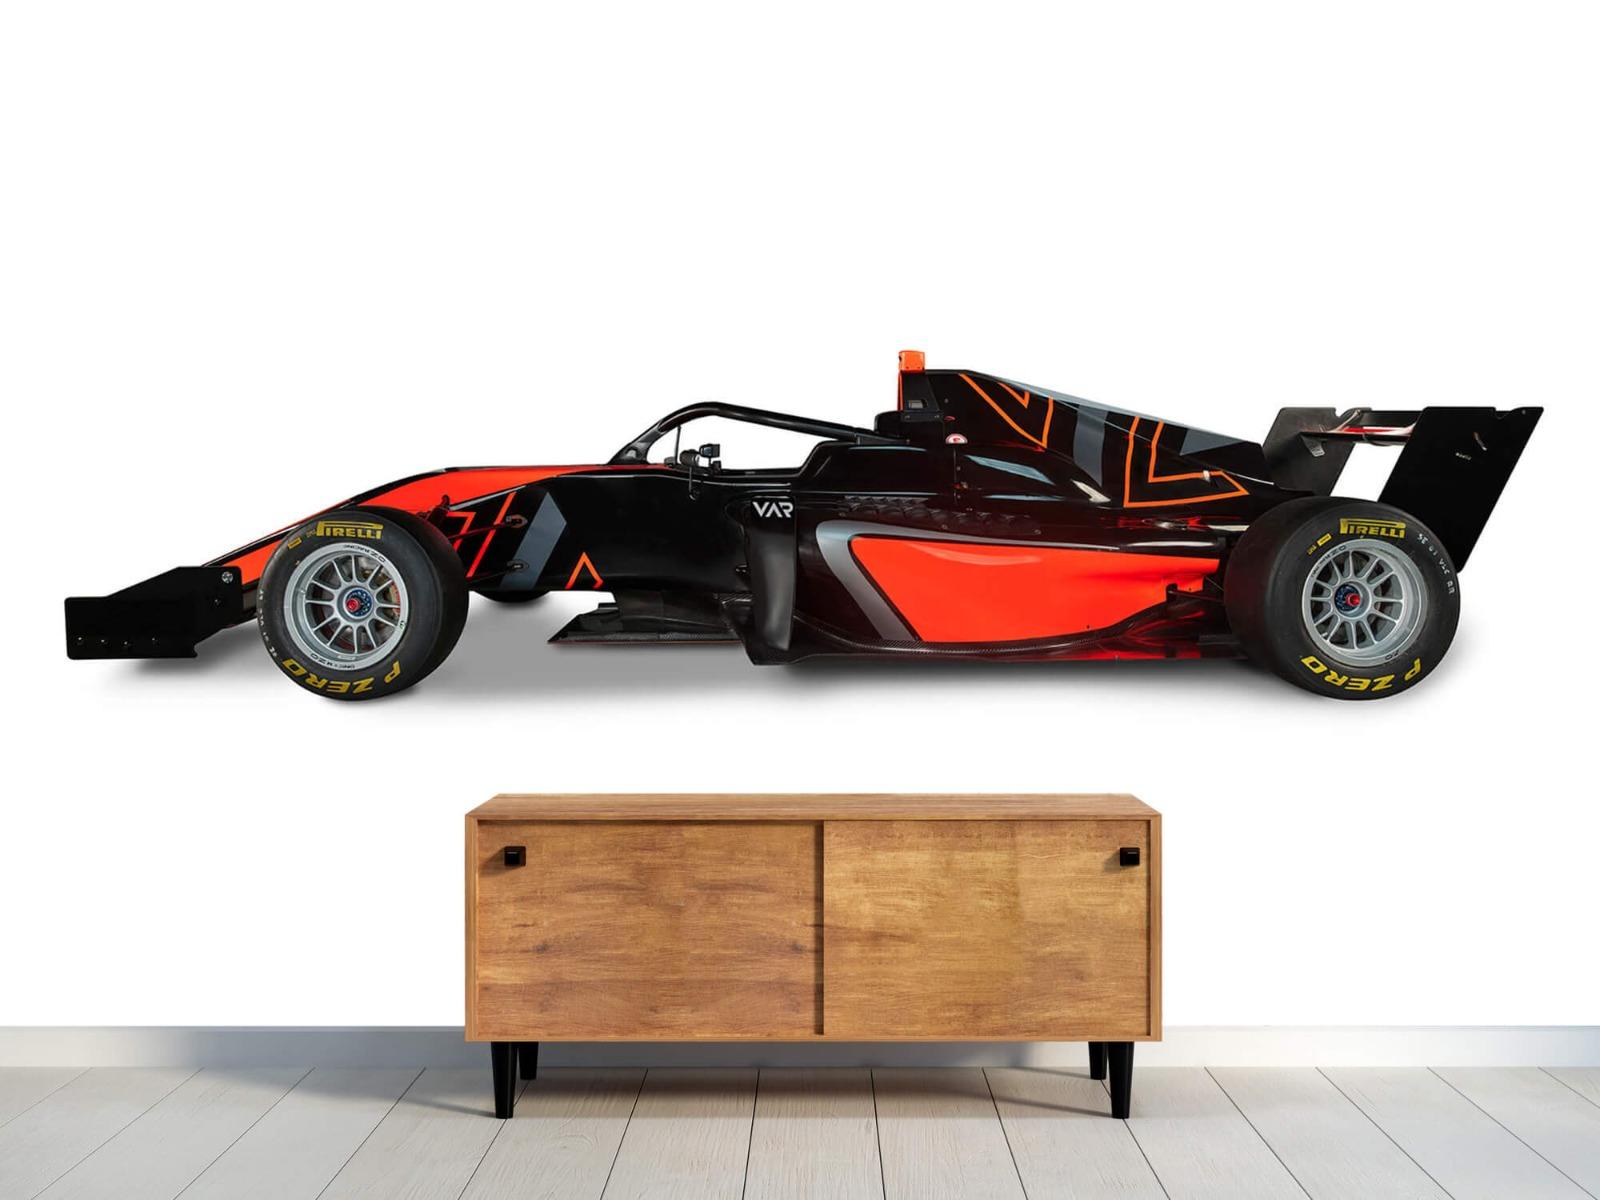 Sportauto's - Formule 3 - Lower side view - Computerruimte 1